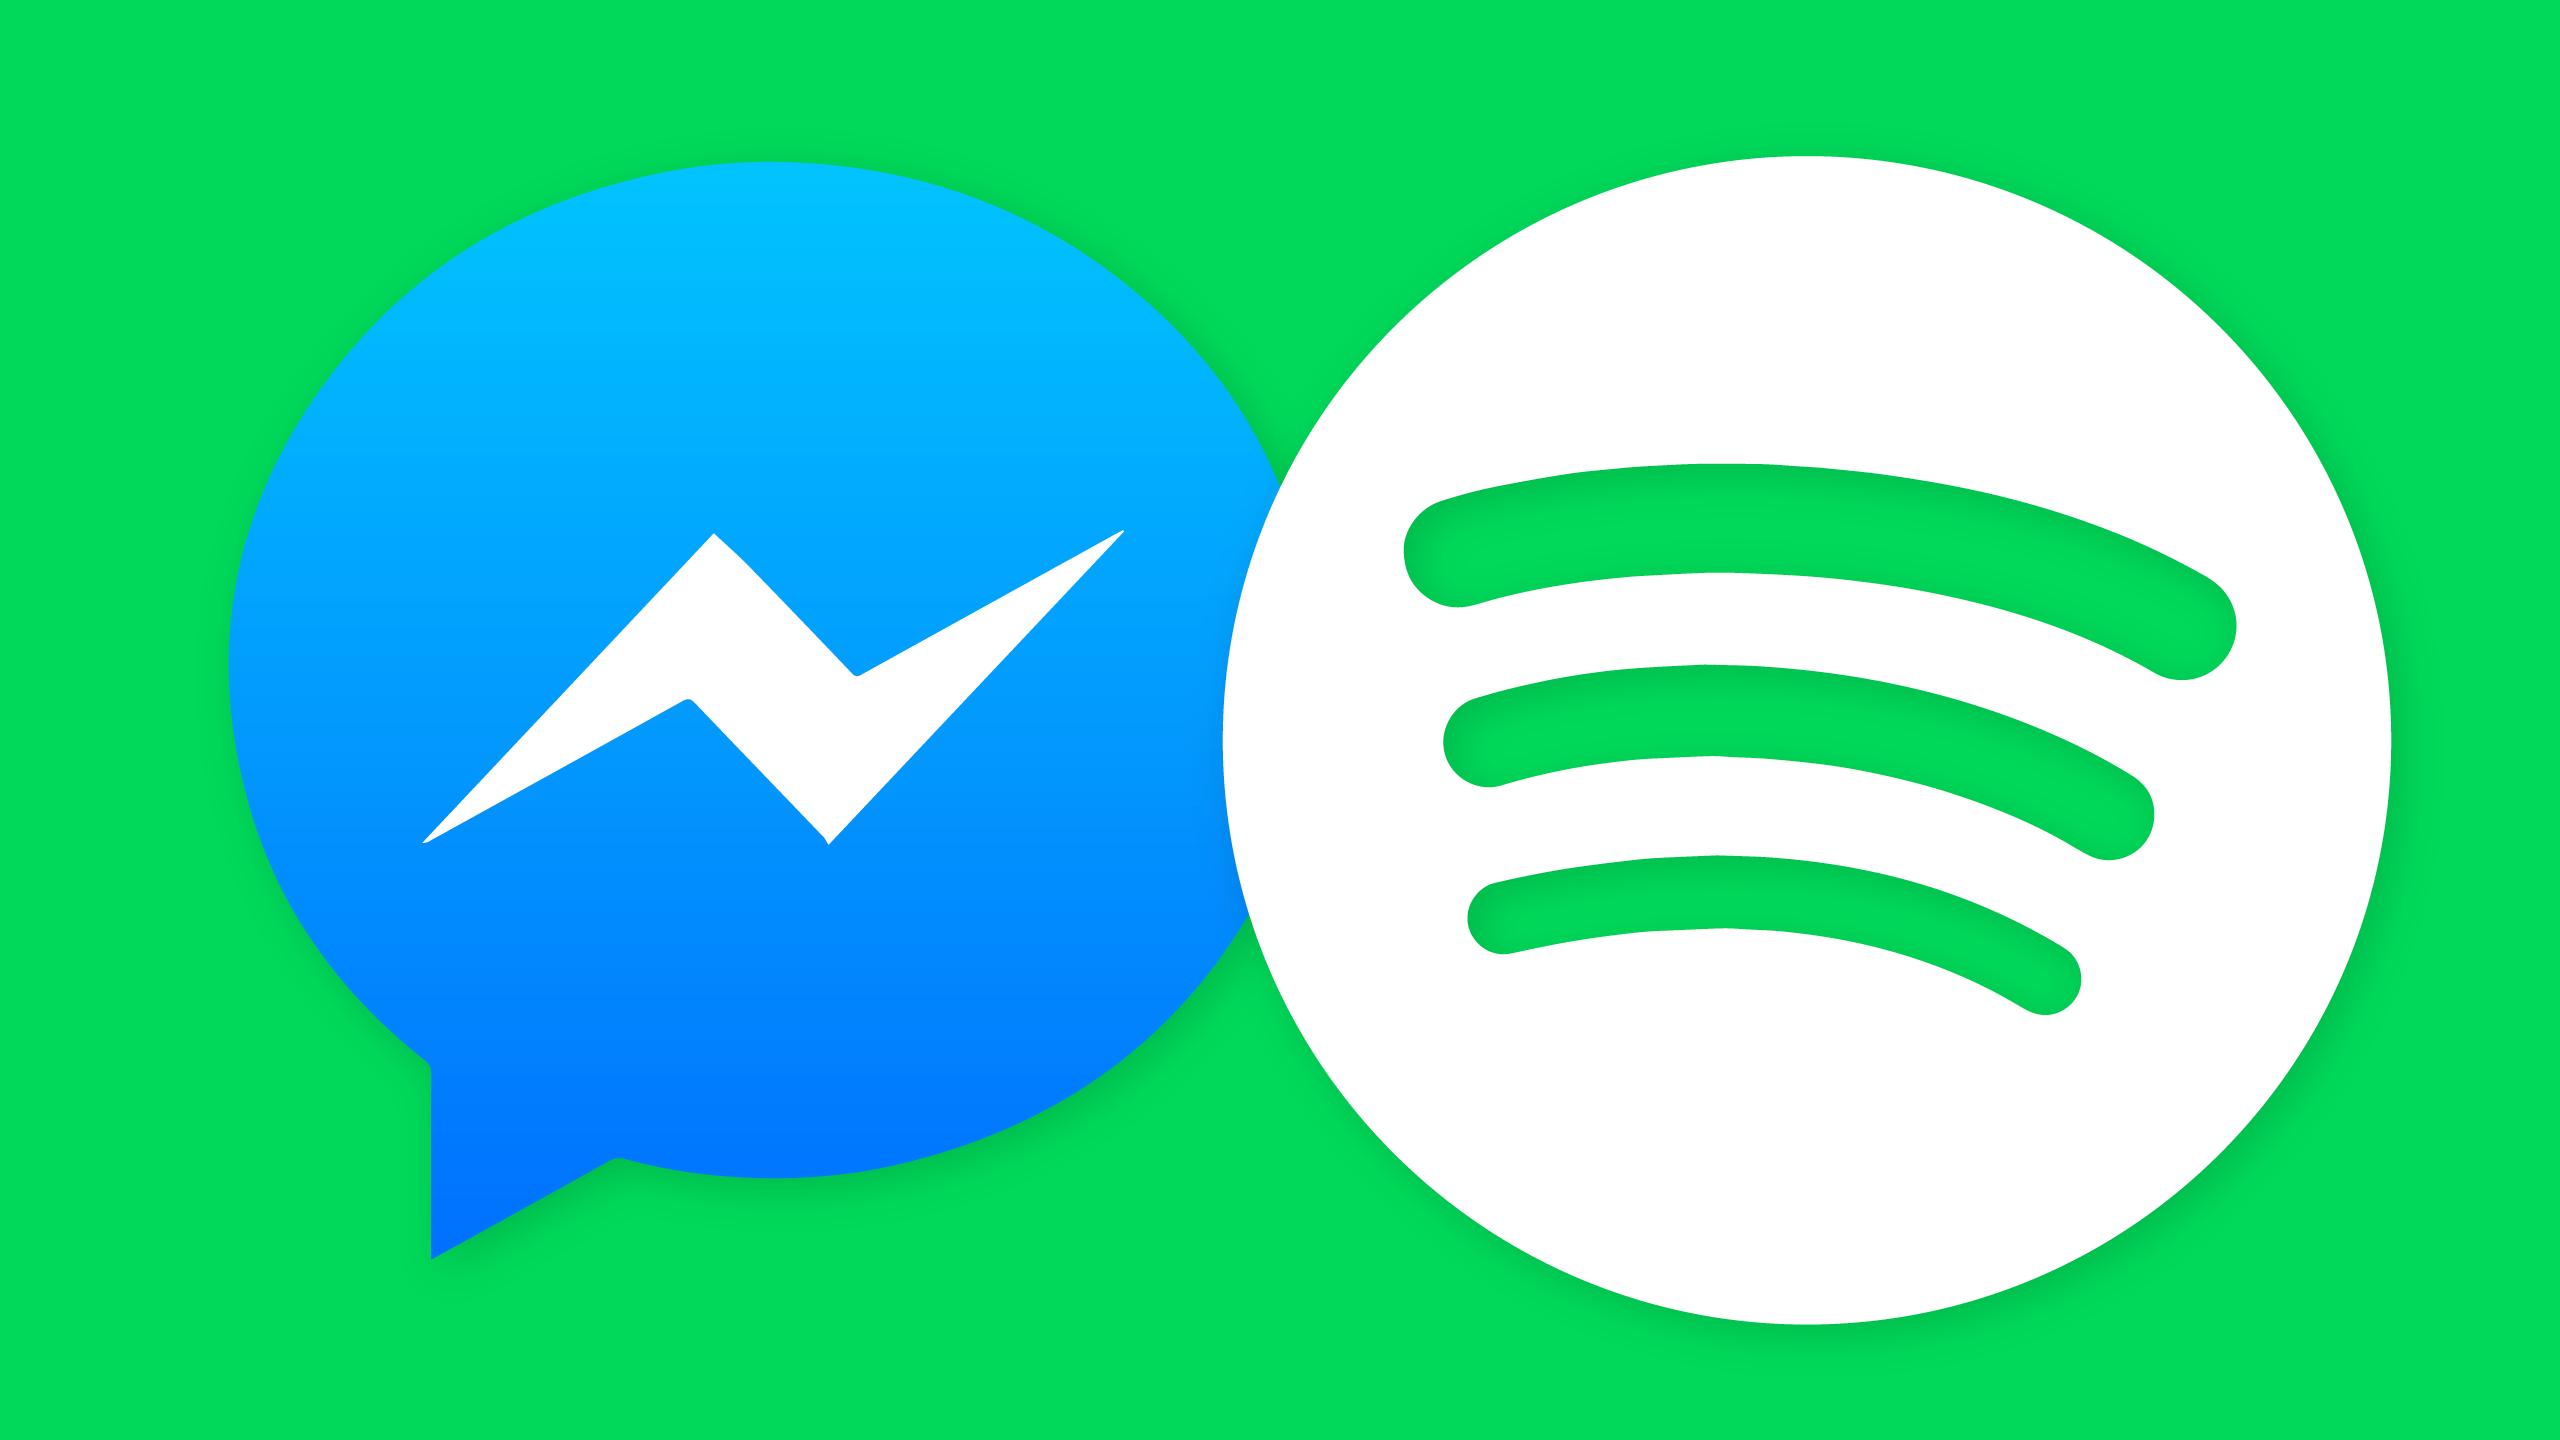 Wallpaper Aesthetic Spotify Logo